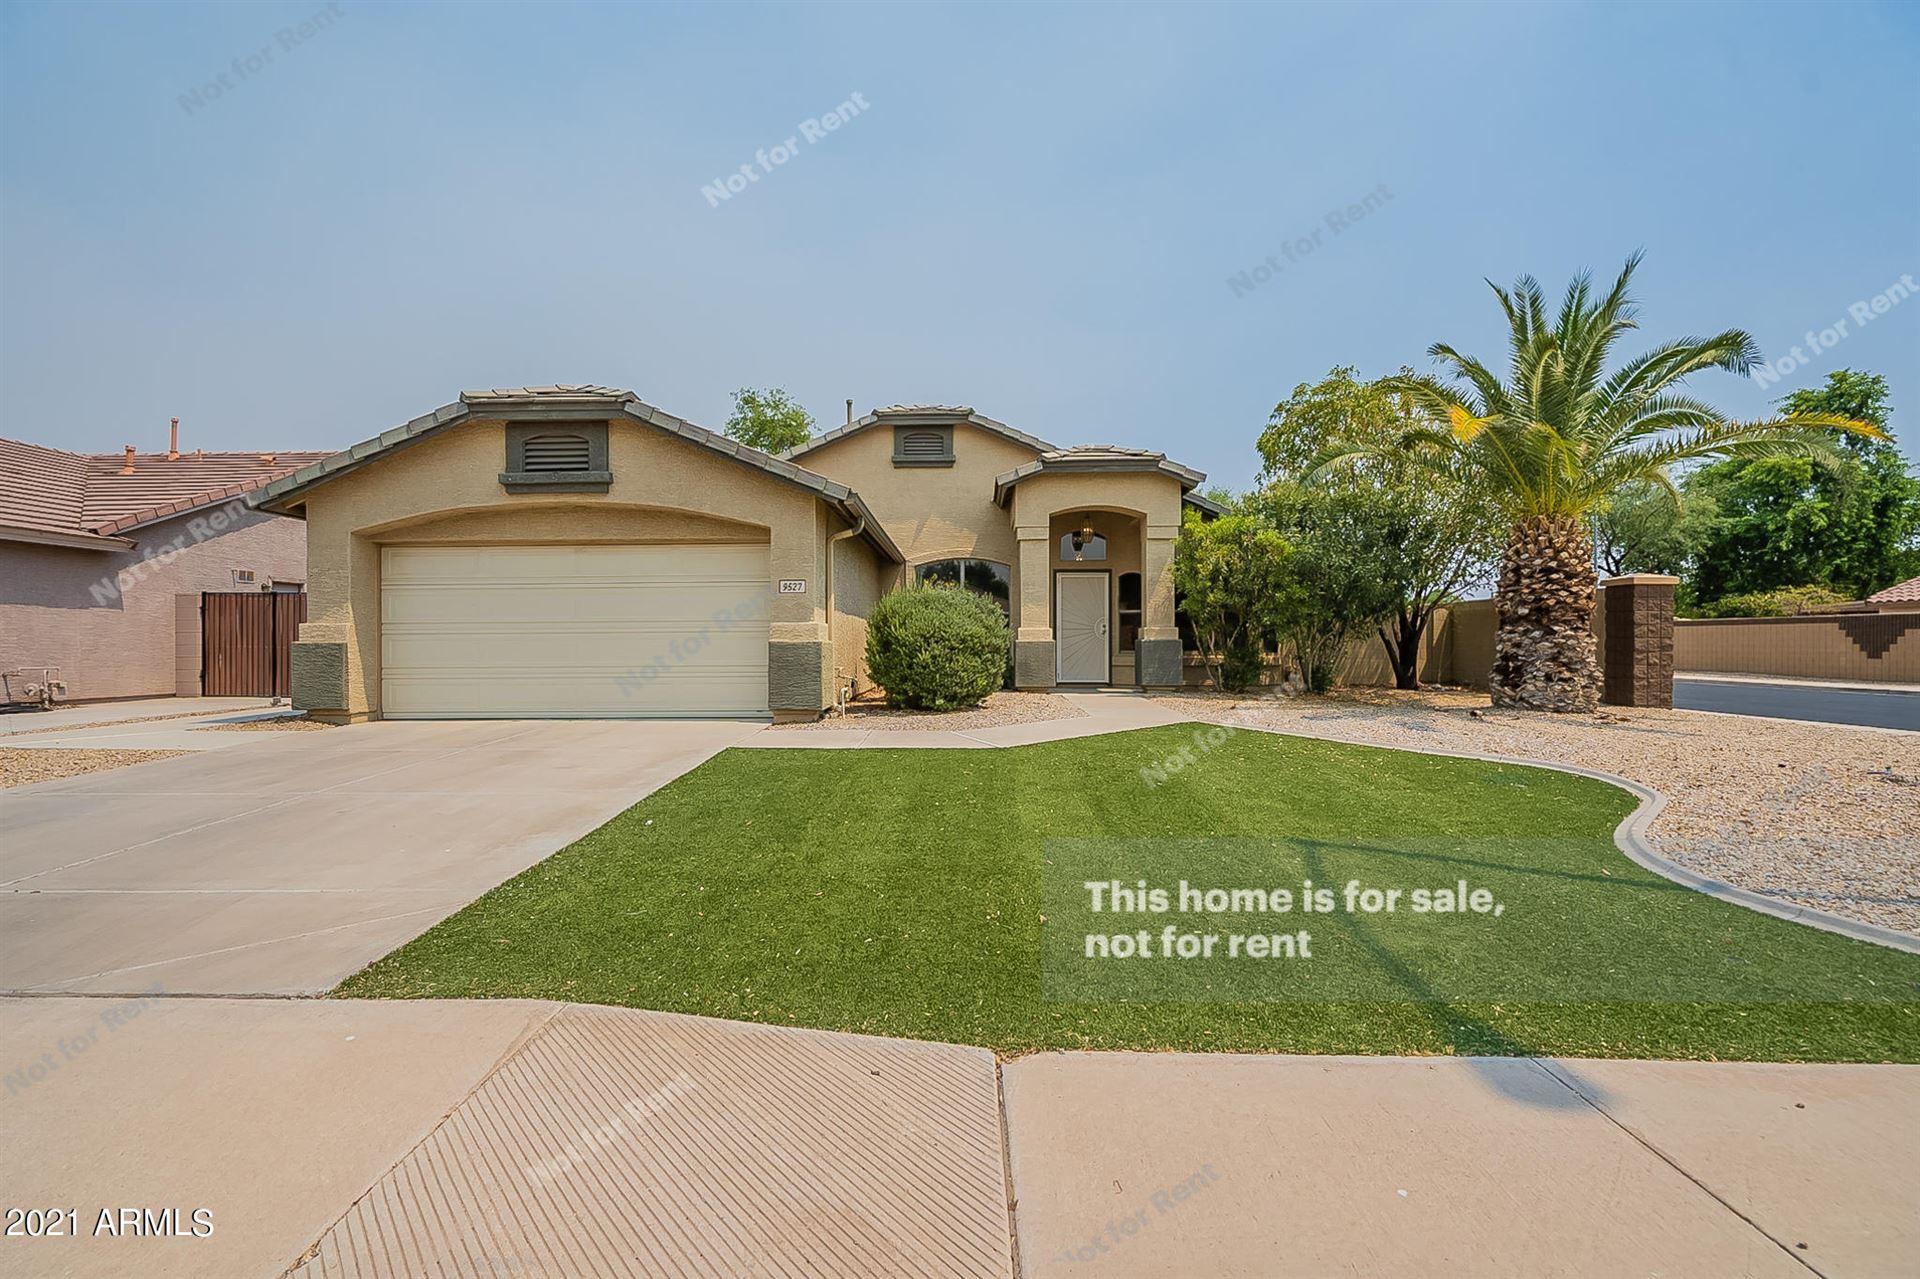 9527 E PLATA Circle, Mesa, AZ 85212 - MLS#: 6251340